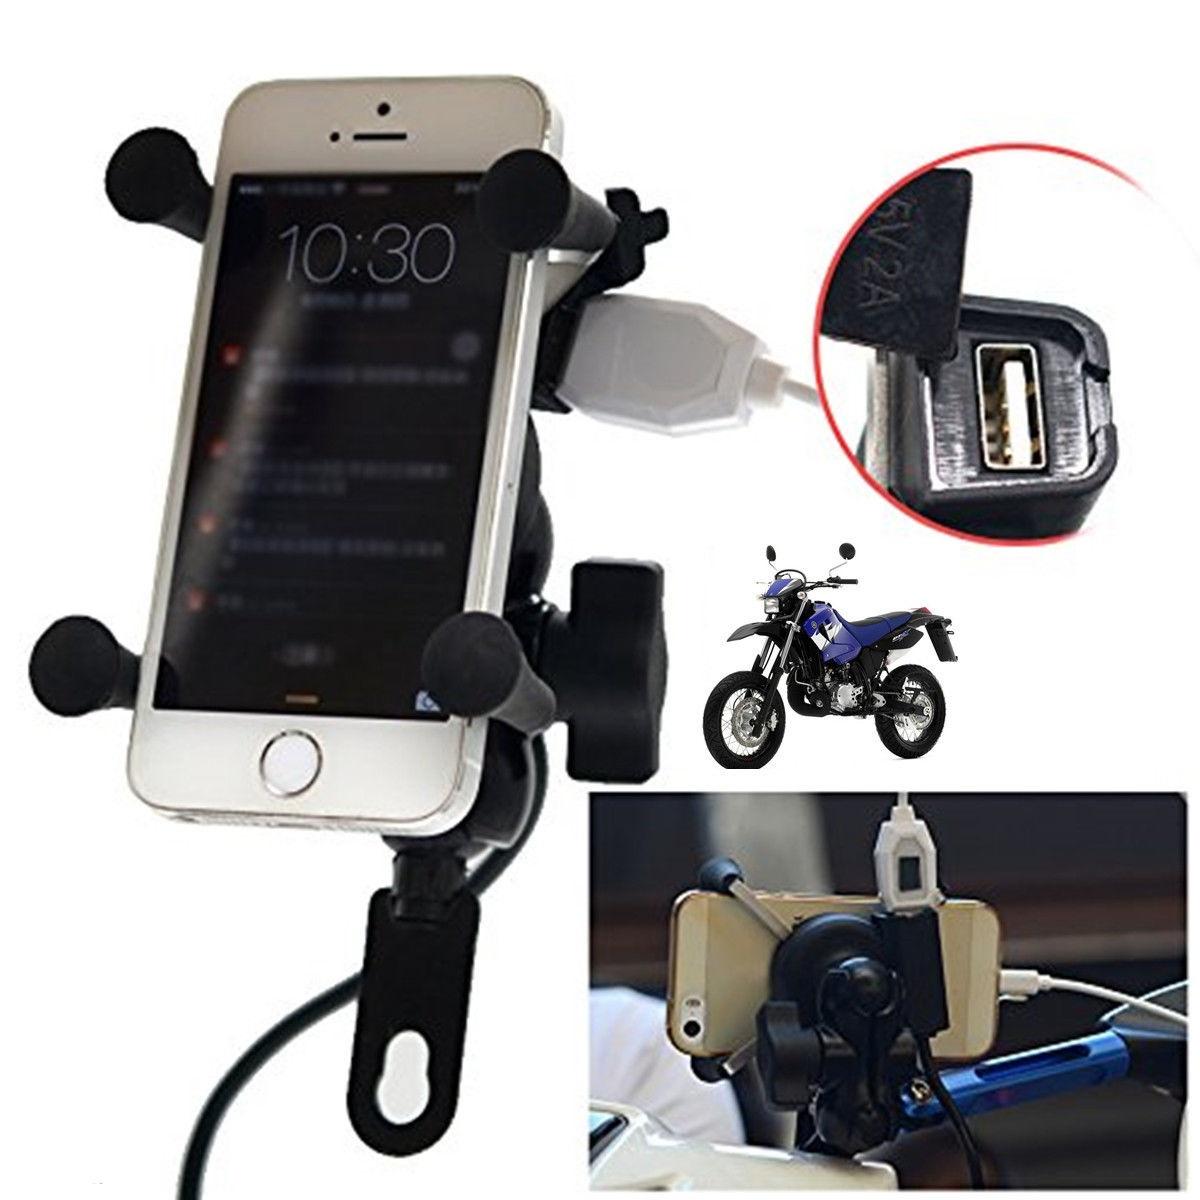 Universal Motorcycle USB Charging Mount Phone GPS Mobile Iphone Cradle Holder